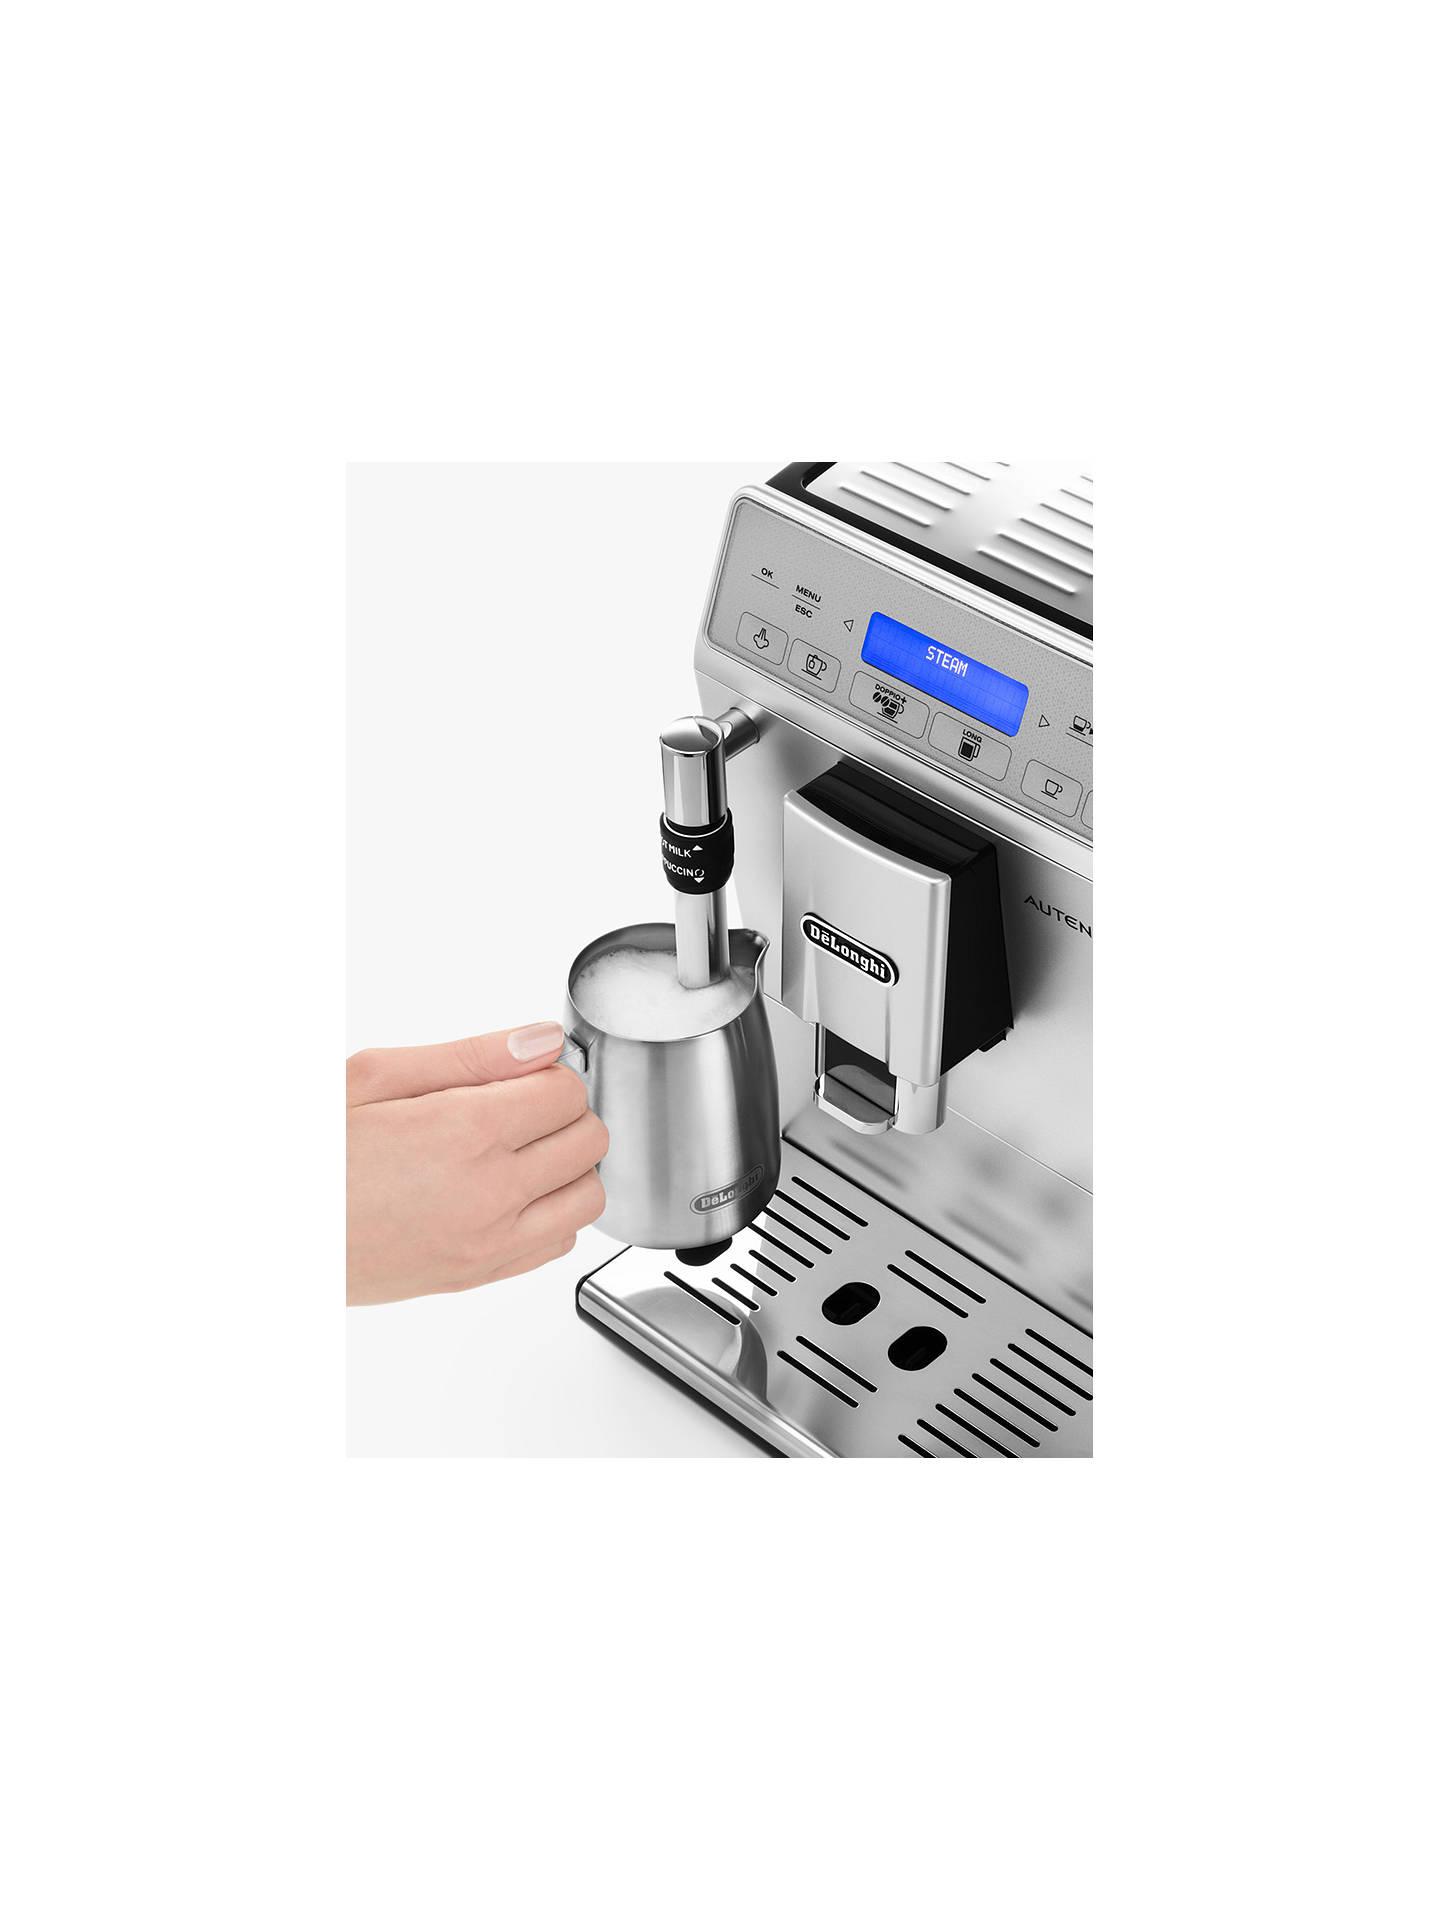 d57f360ad41 ... Buy De'Longhi Autentica Plus ETAM 29.620.SB Bean-to-Cup Coffee ...